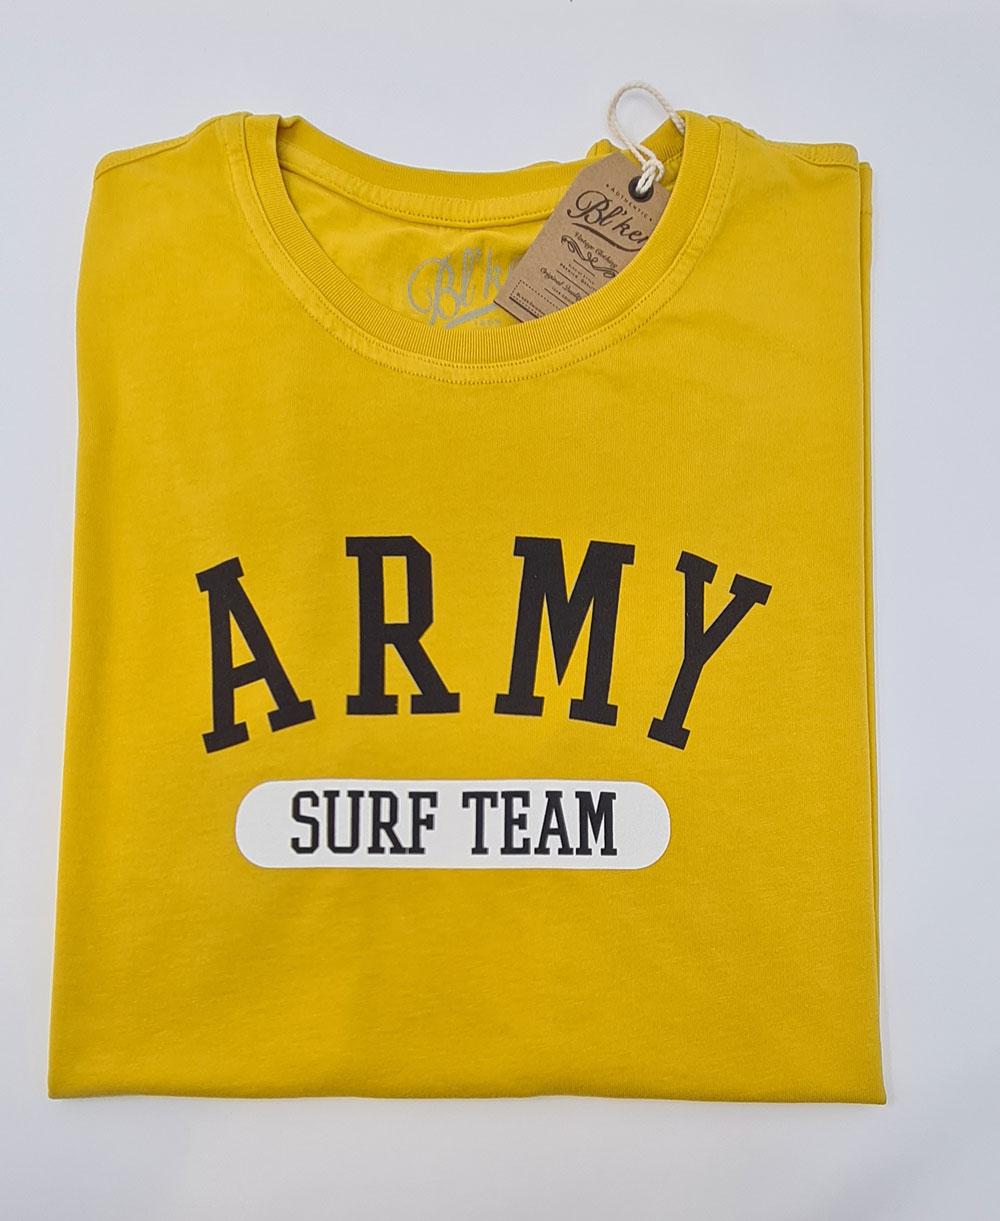 Army Surf Team T-Shirt Manica Corta Uomo Yellow